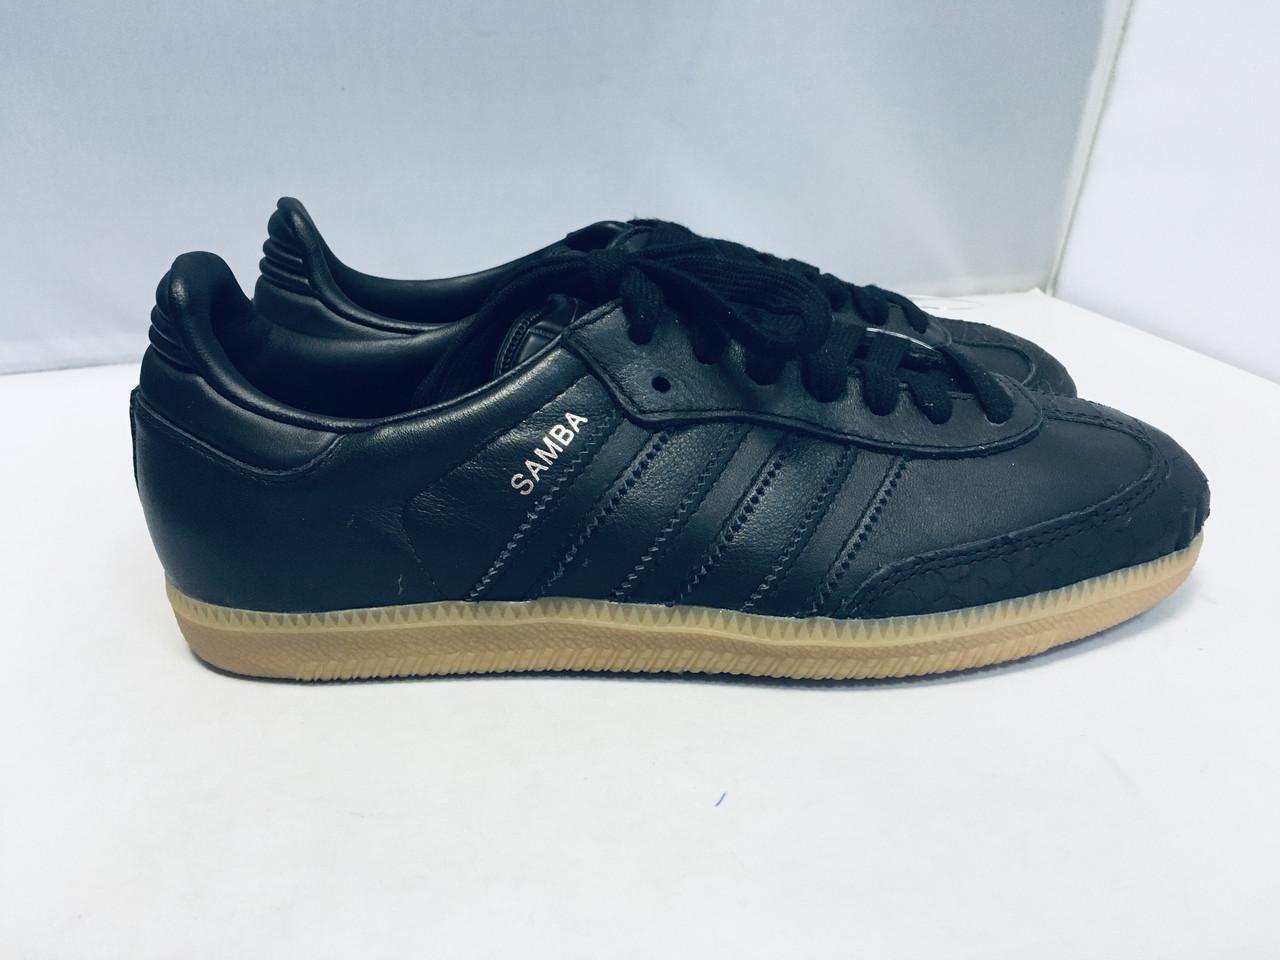 Кроссовки Adidas Samba, 36 размер